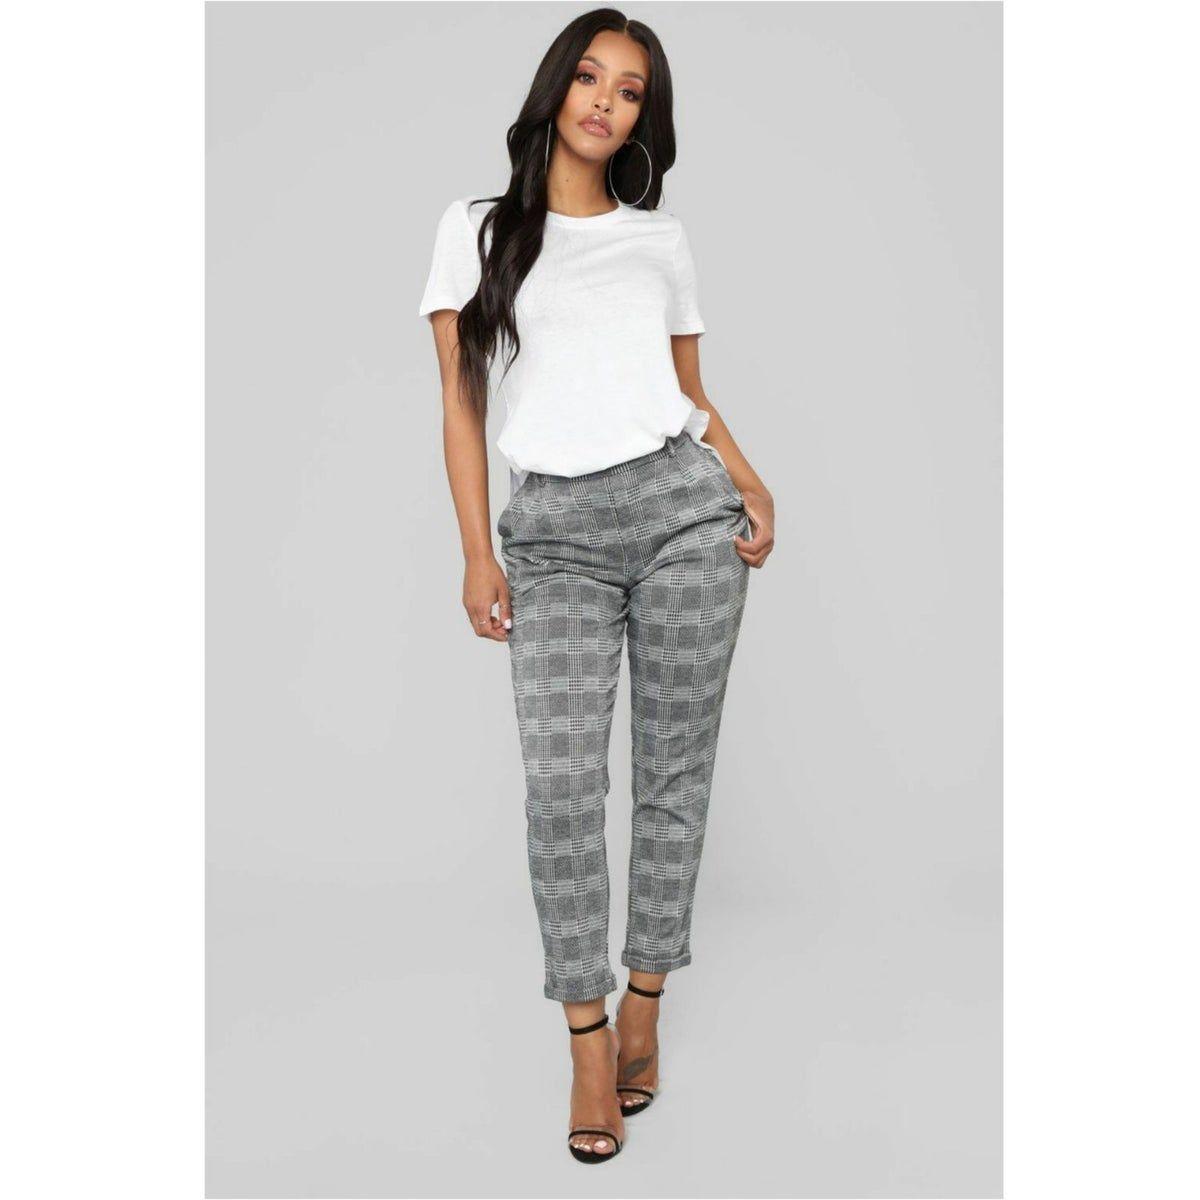 Fashion Nova Plaid Pants Black And White Pants Black Dress Pants Outfits Pants Outfit Work [ 1200 x 1200 Pixel ]